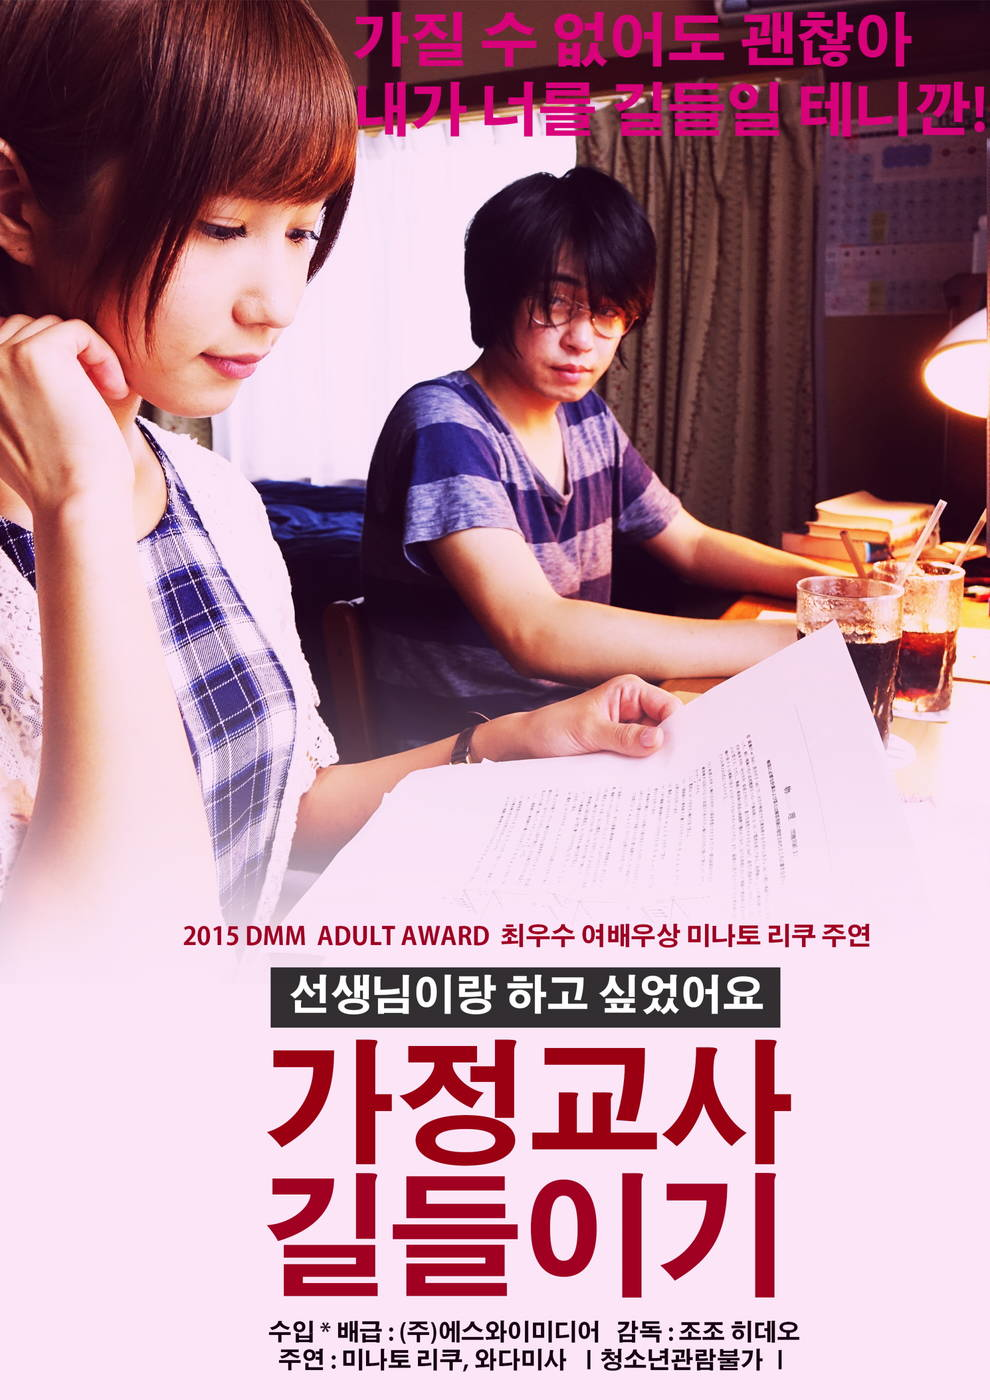 Kinky Spiral (2016) 가정교사 길들이기 [ญี่ปุ่น 18+] [Soundtrack ไม่มีบรรยายไทย]